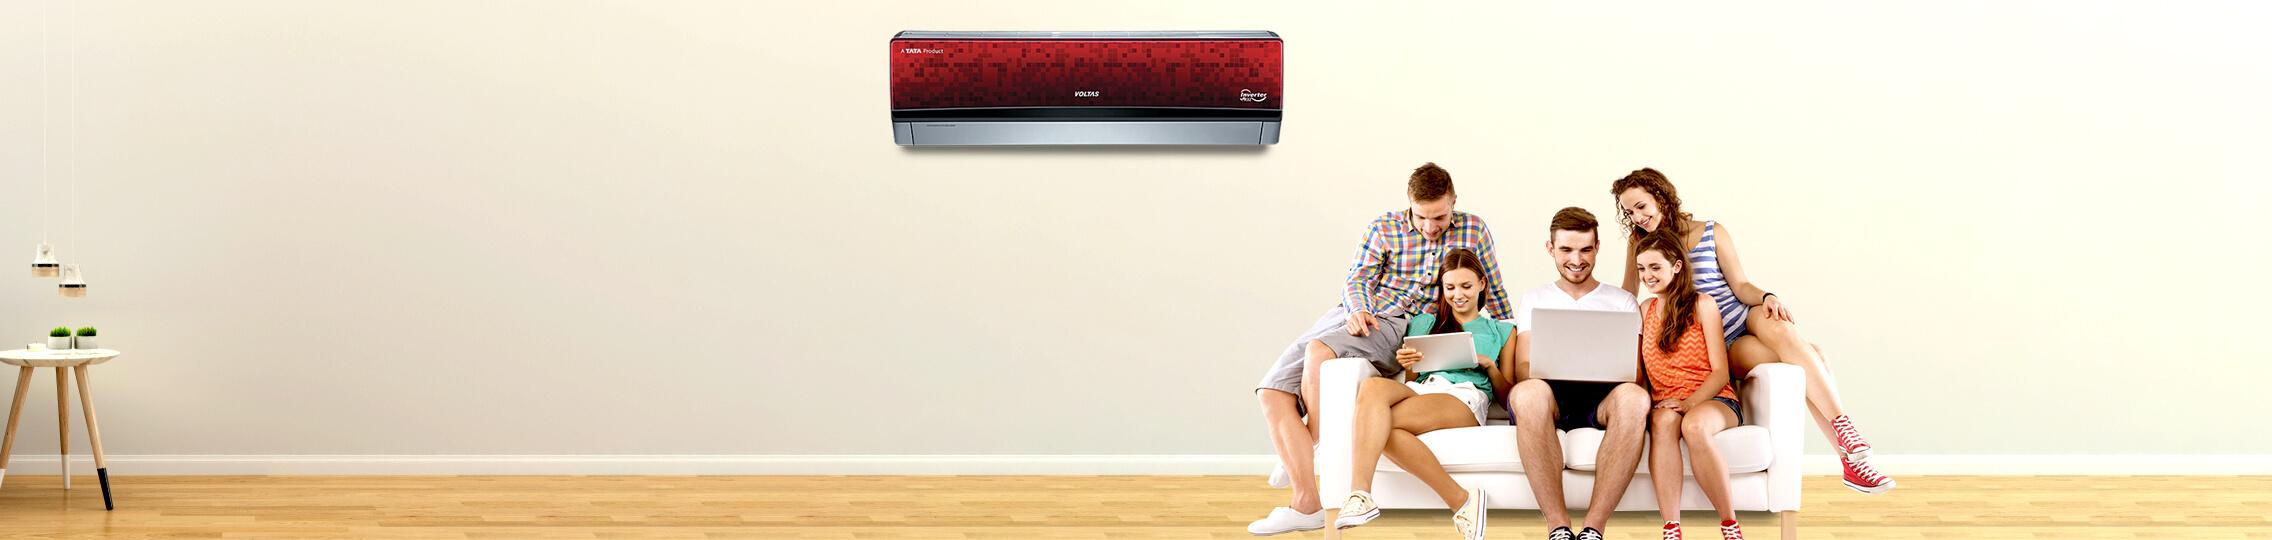 Adjustable Inverter AC: Meeting a Millennial Need